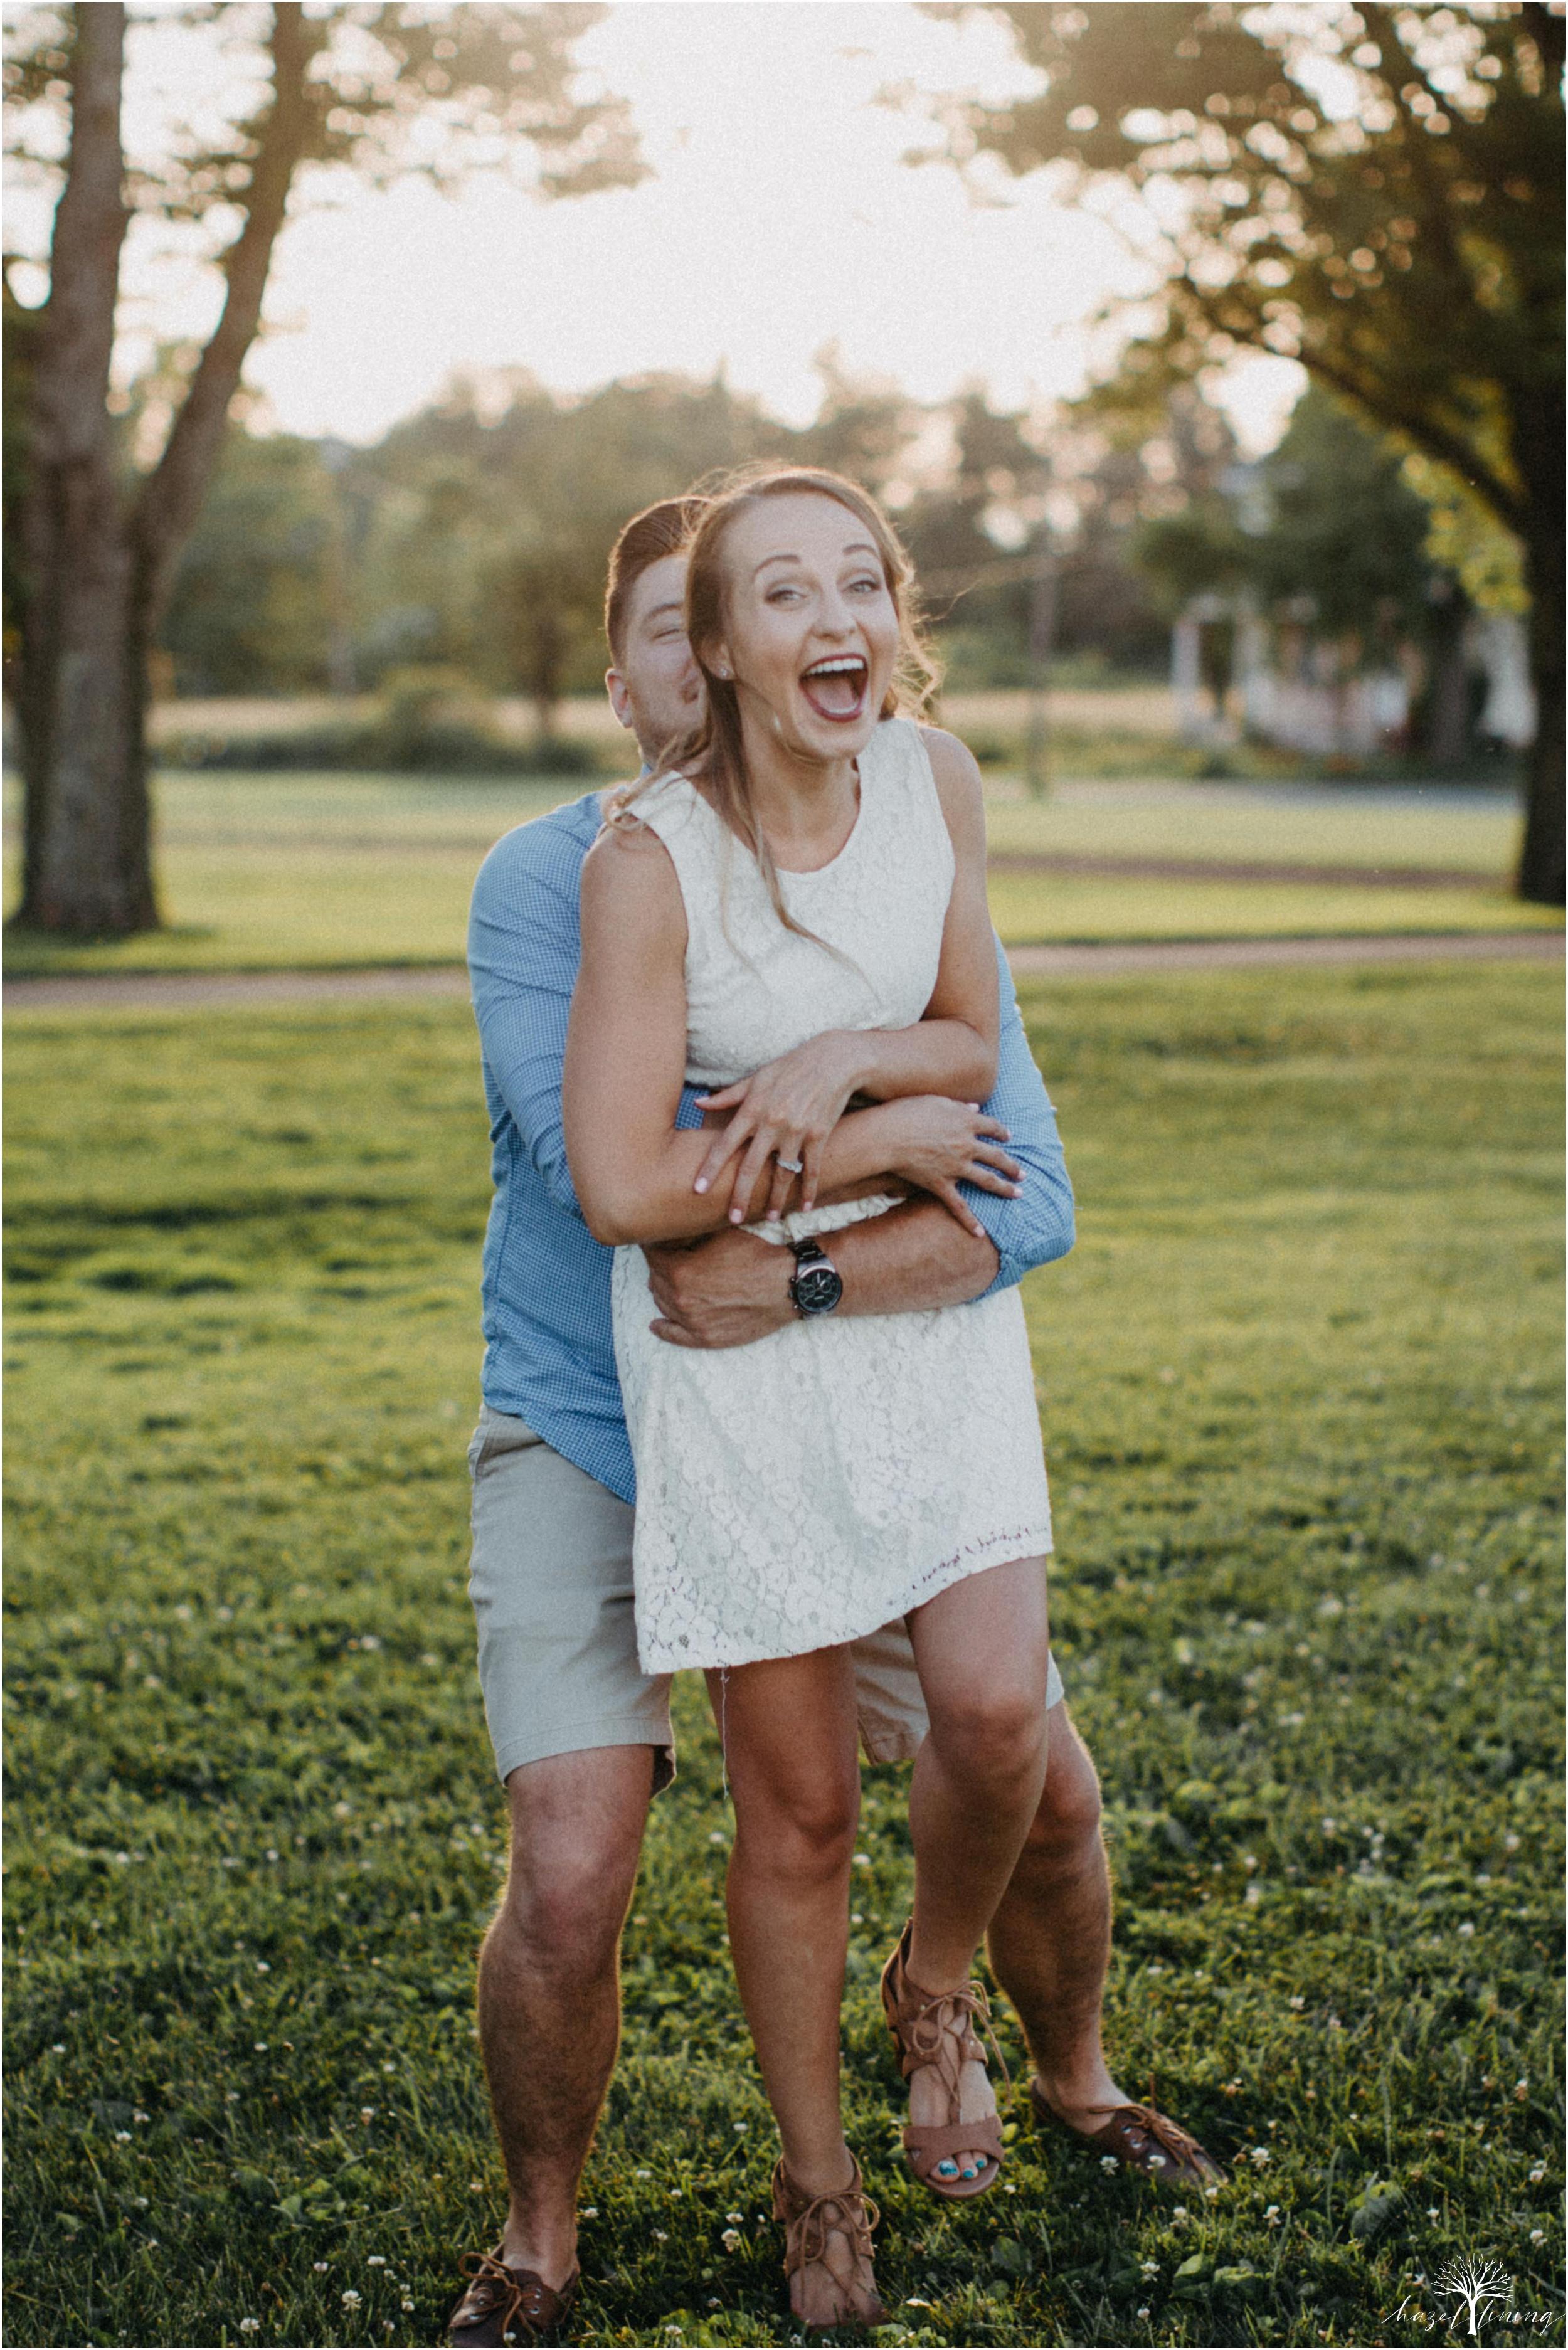 rachel-warner-chris-niedrist-the-farm-bakery-and-events-quakertown-pa-summer-engagement-hazel-lining-photography-destination-elopement-wedding-engagement-photography_0028.jpg